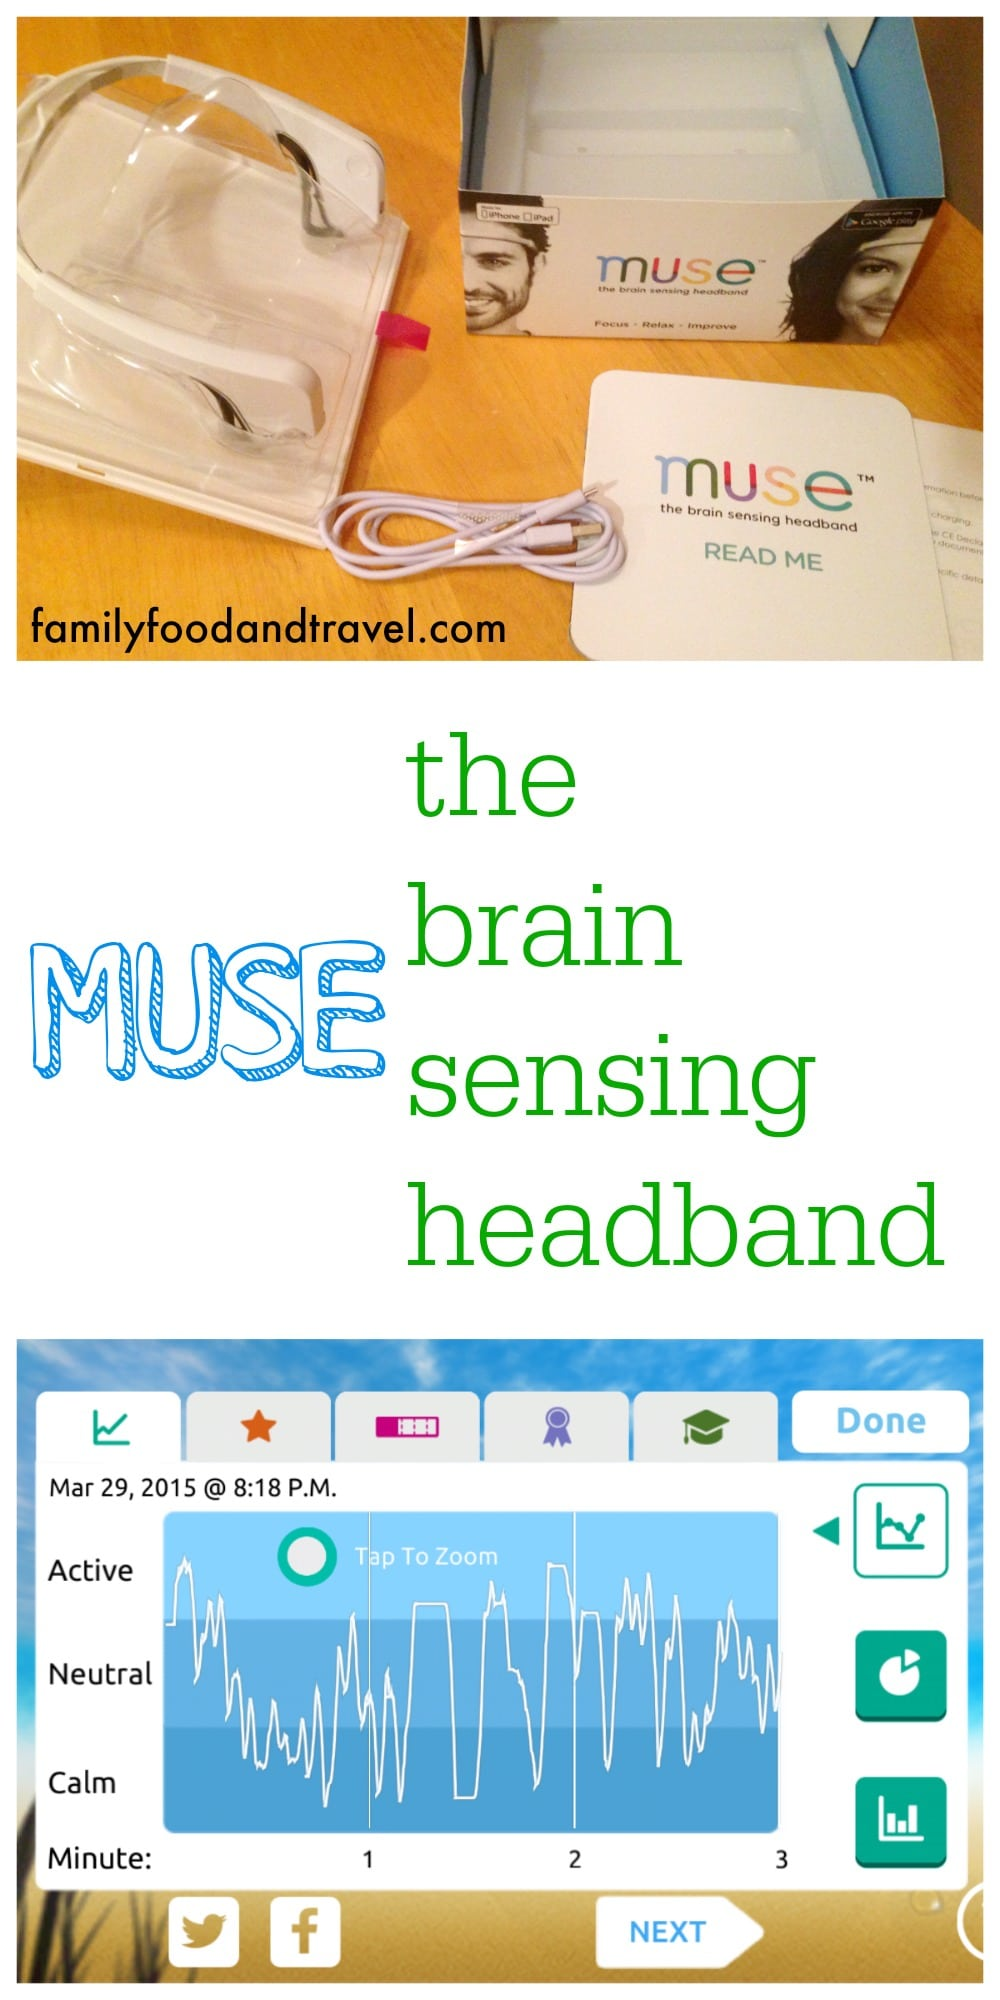 Training My Brain with Muse the Brain Sensing Headband